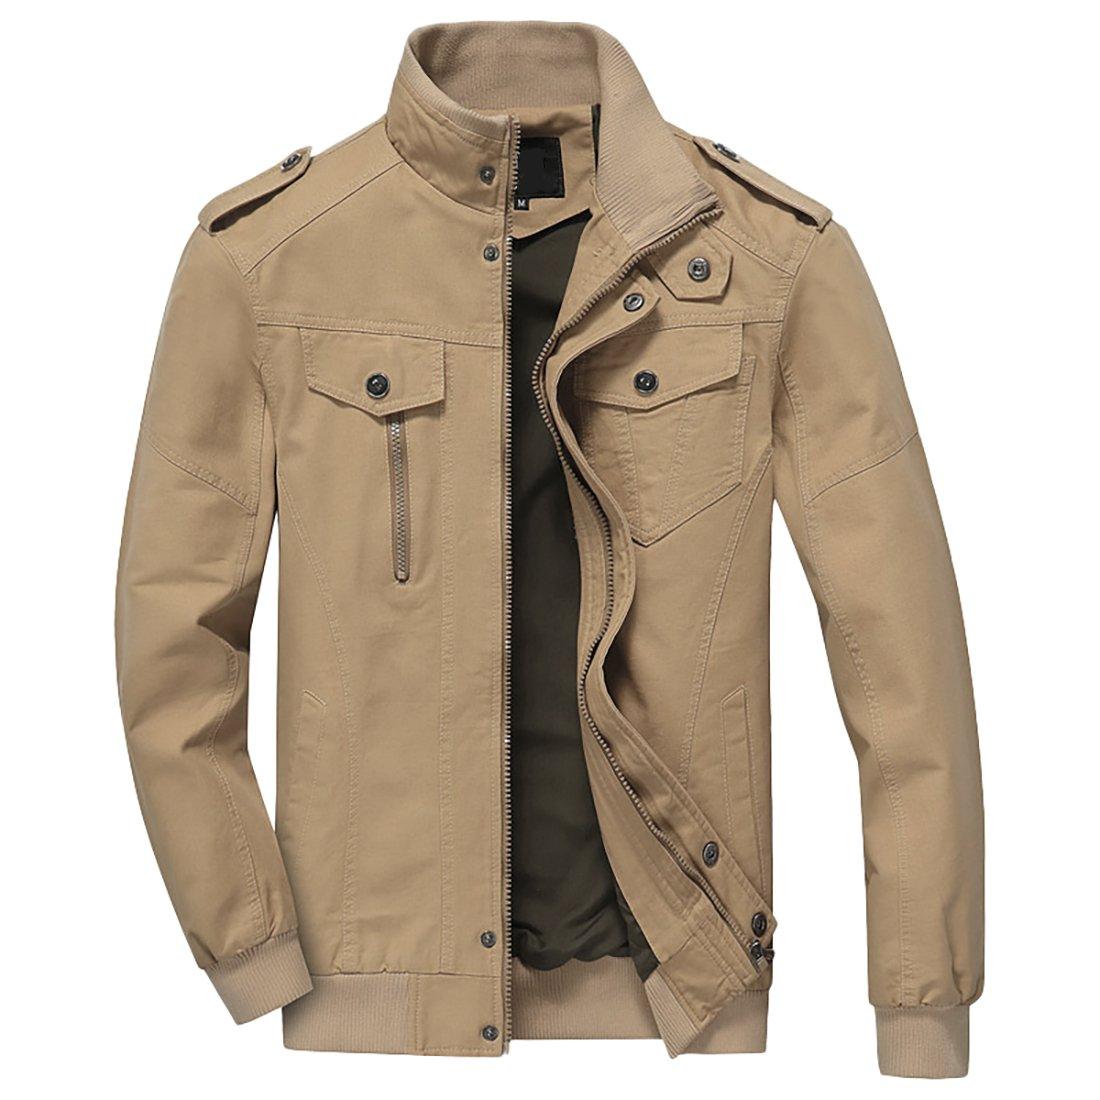 Nantersan Men's Casual Military Jacket Cotton Outdoor Coat Lightweight Windbreaker Jackets by Nantersan